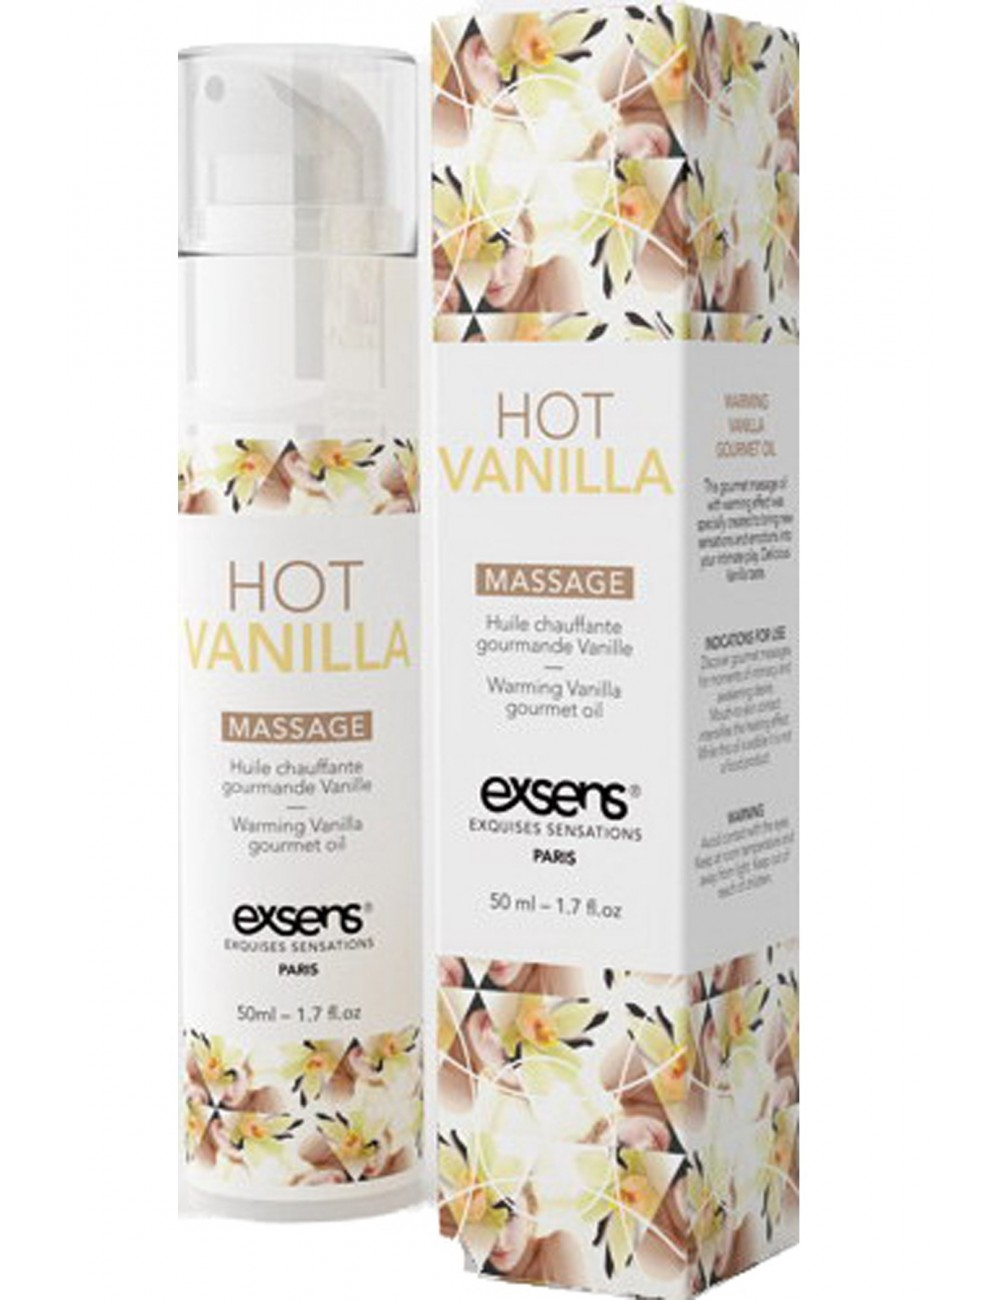 Huile chauffante Gourmande Vanille 50ml - Huiles de massage - Exsens